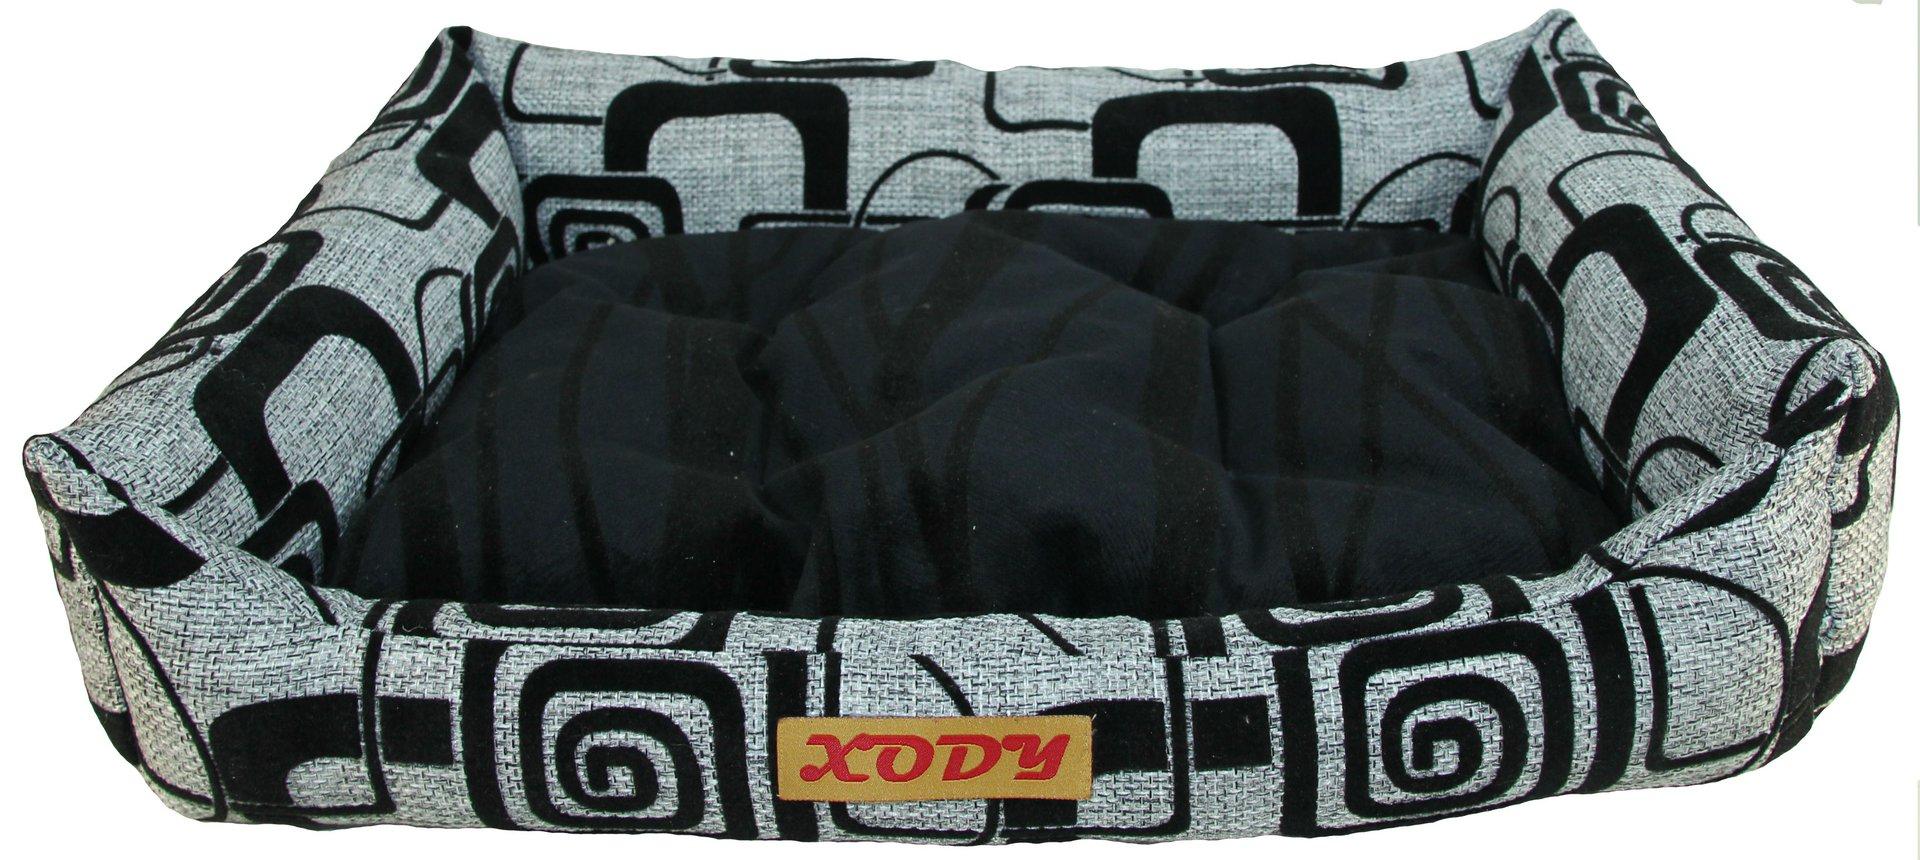 Лежак для собак Xody Люкс №6, флок, Серый, 100х90х28 см